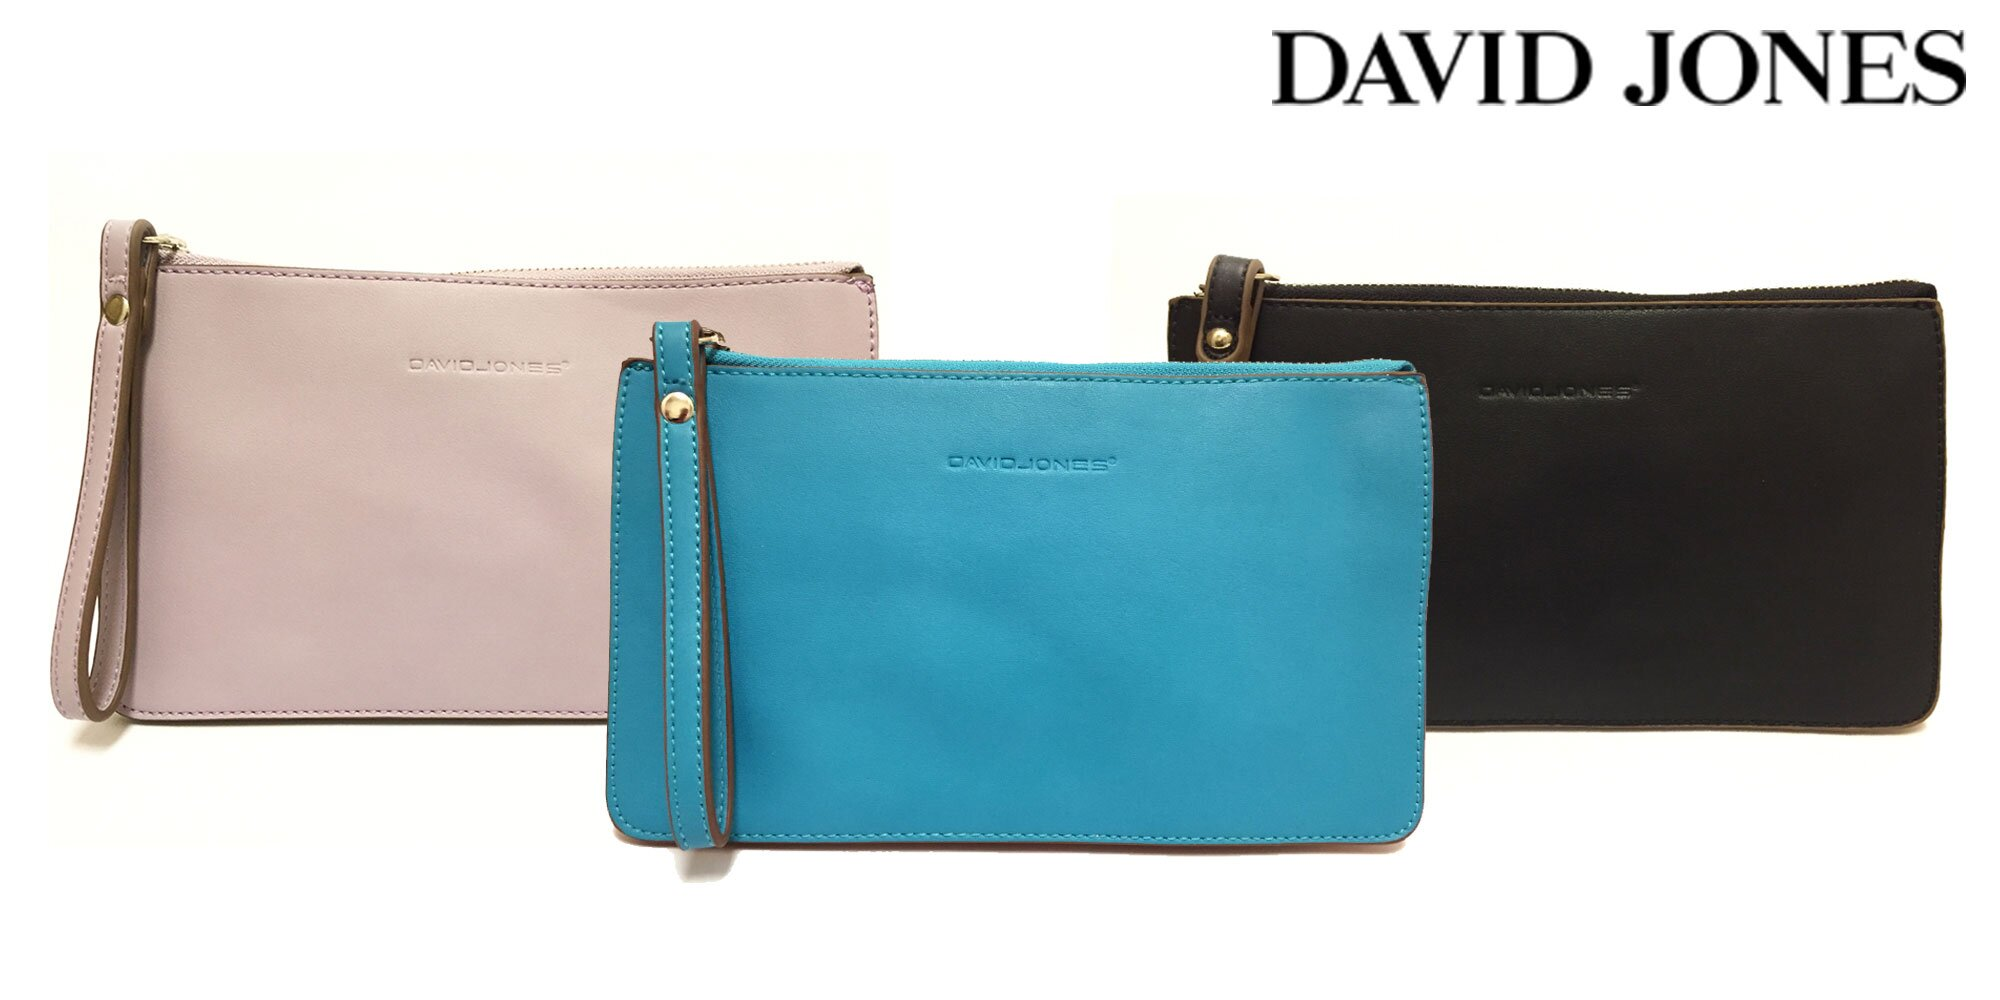 Dámske listové kabelky David Jones vo veselých farbách  d21e4ca36ef